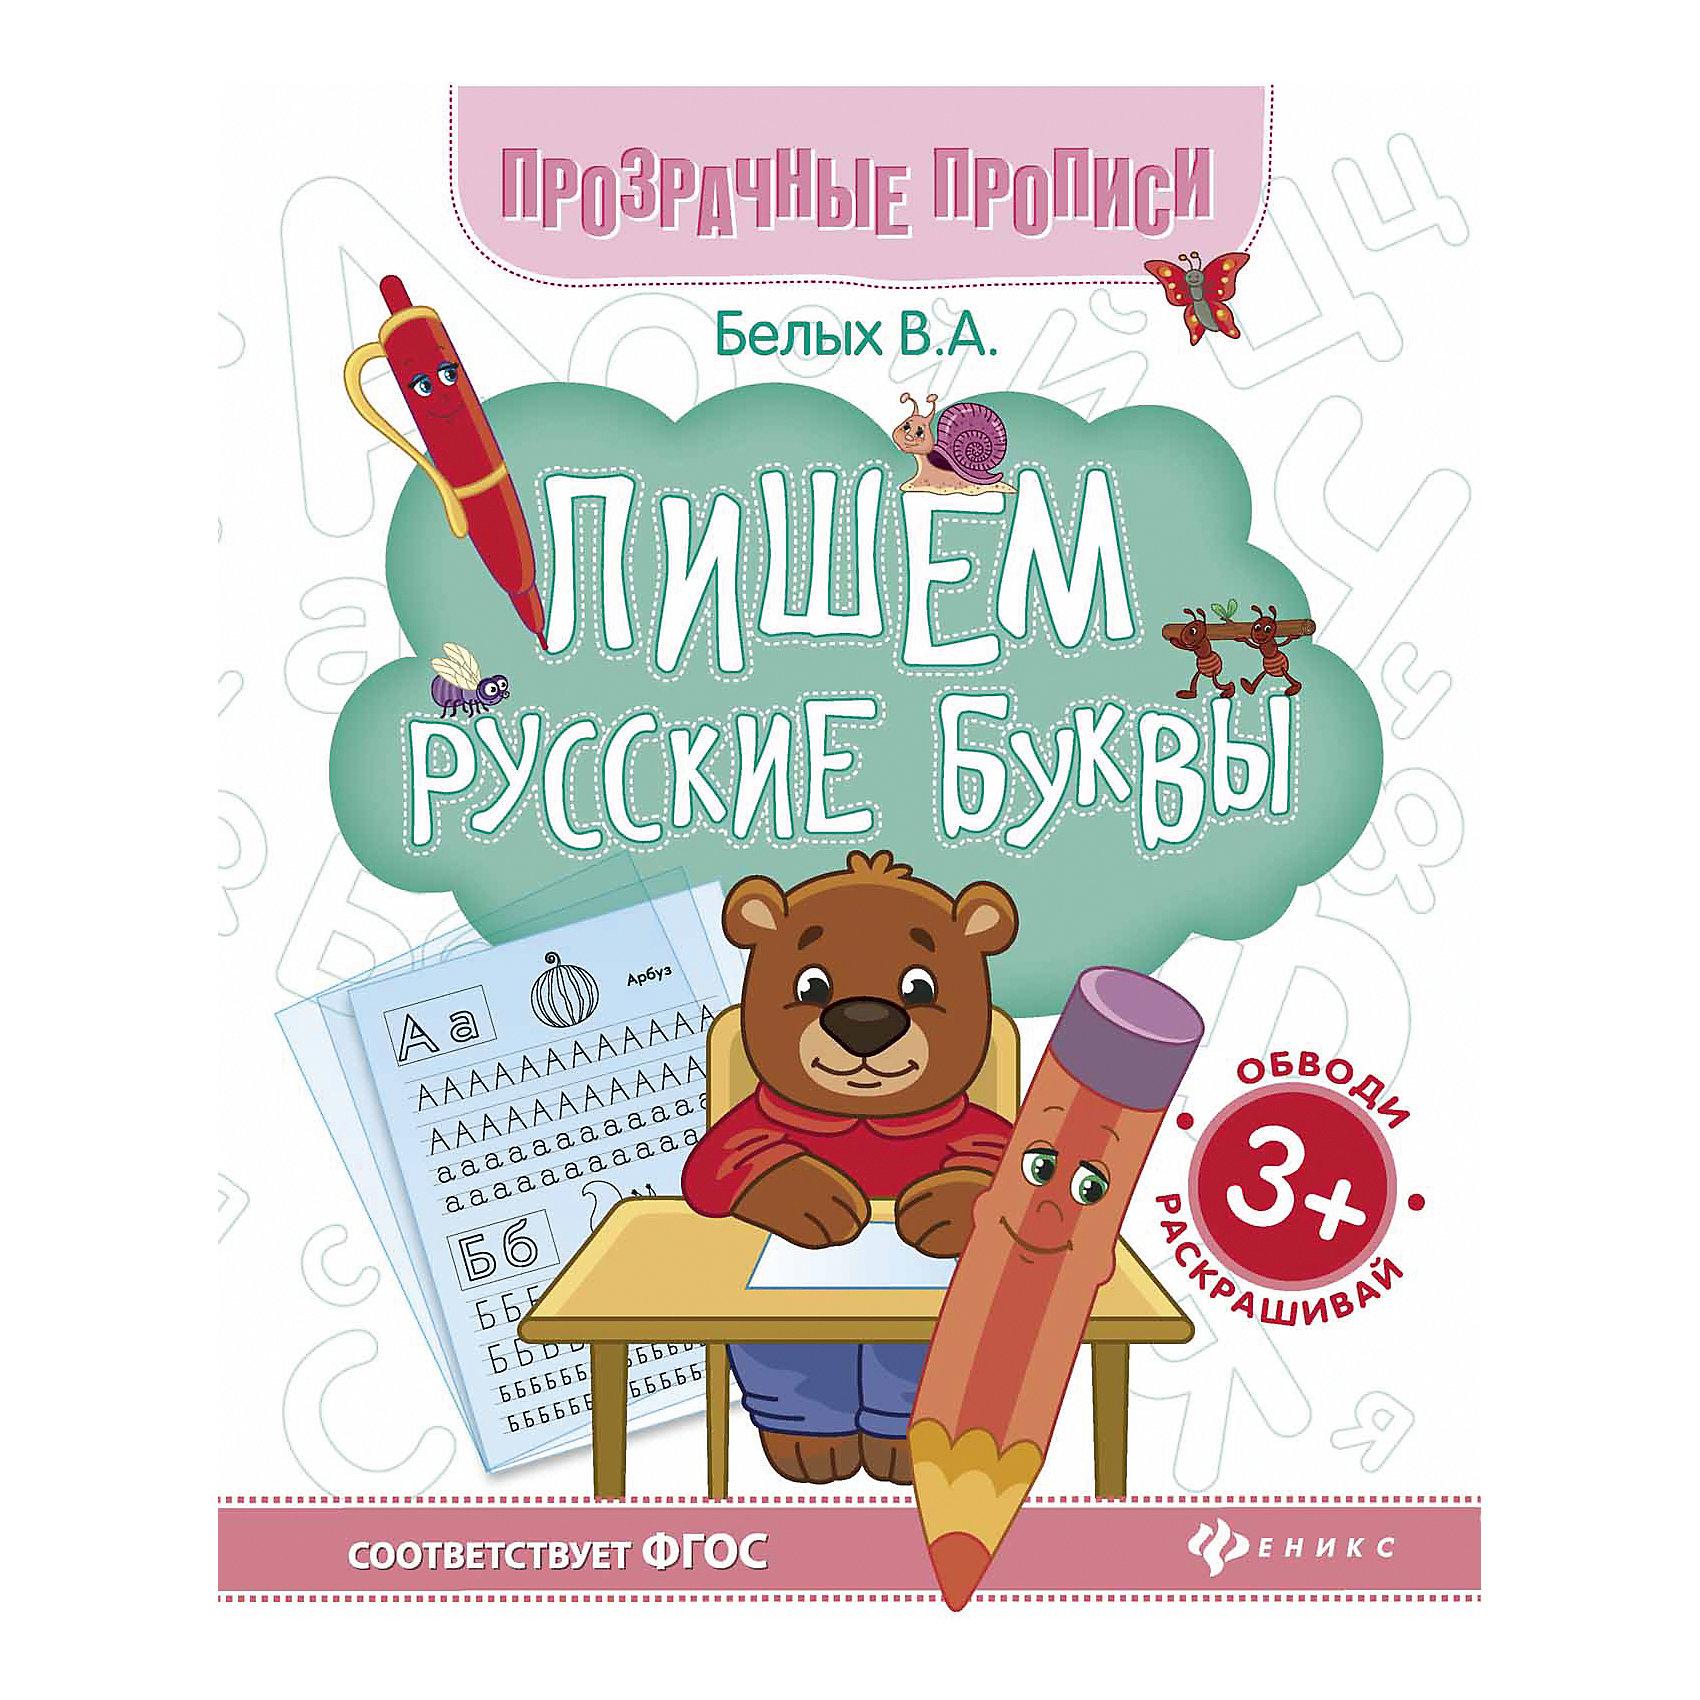 Книга Пишем русские буквы<br><br>Ширина мм: 263<br>Глубина мм: 200<br>Высота мм: 30<br>Вес г: 126<br>Возраст от месяцев: -2147483648<br>Возраст до месяцев: 2147483647<br>Пол: Унисекс<br>Возраст: Детский<br>SKU: 5464530